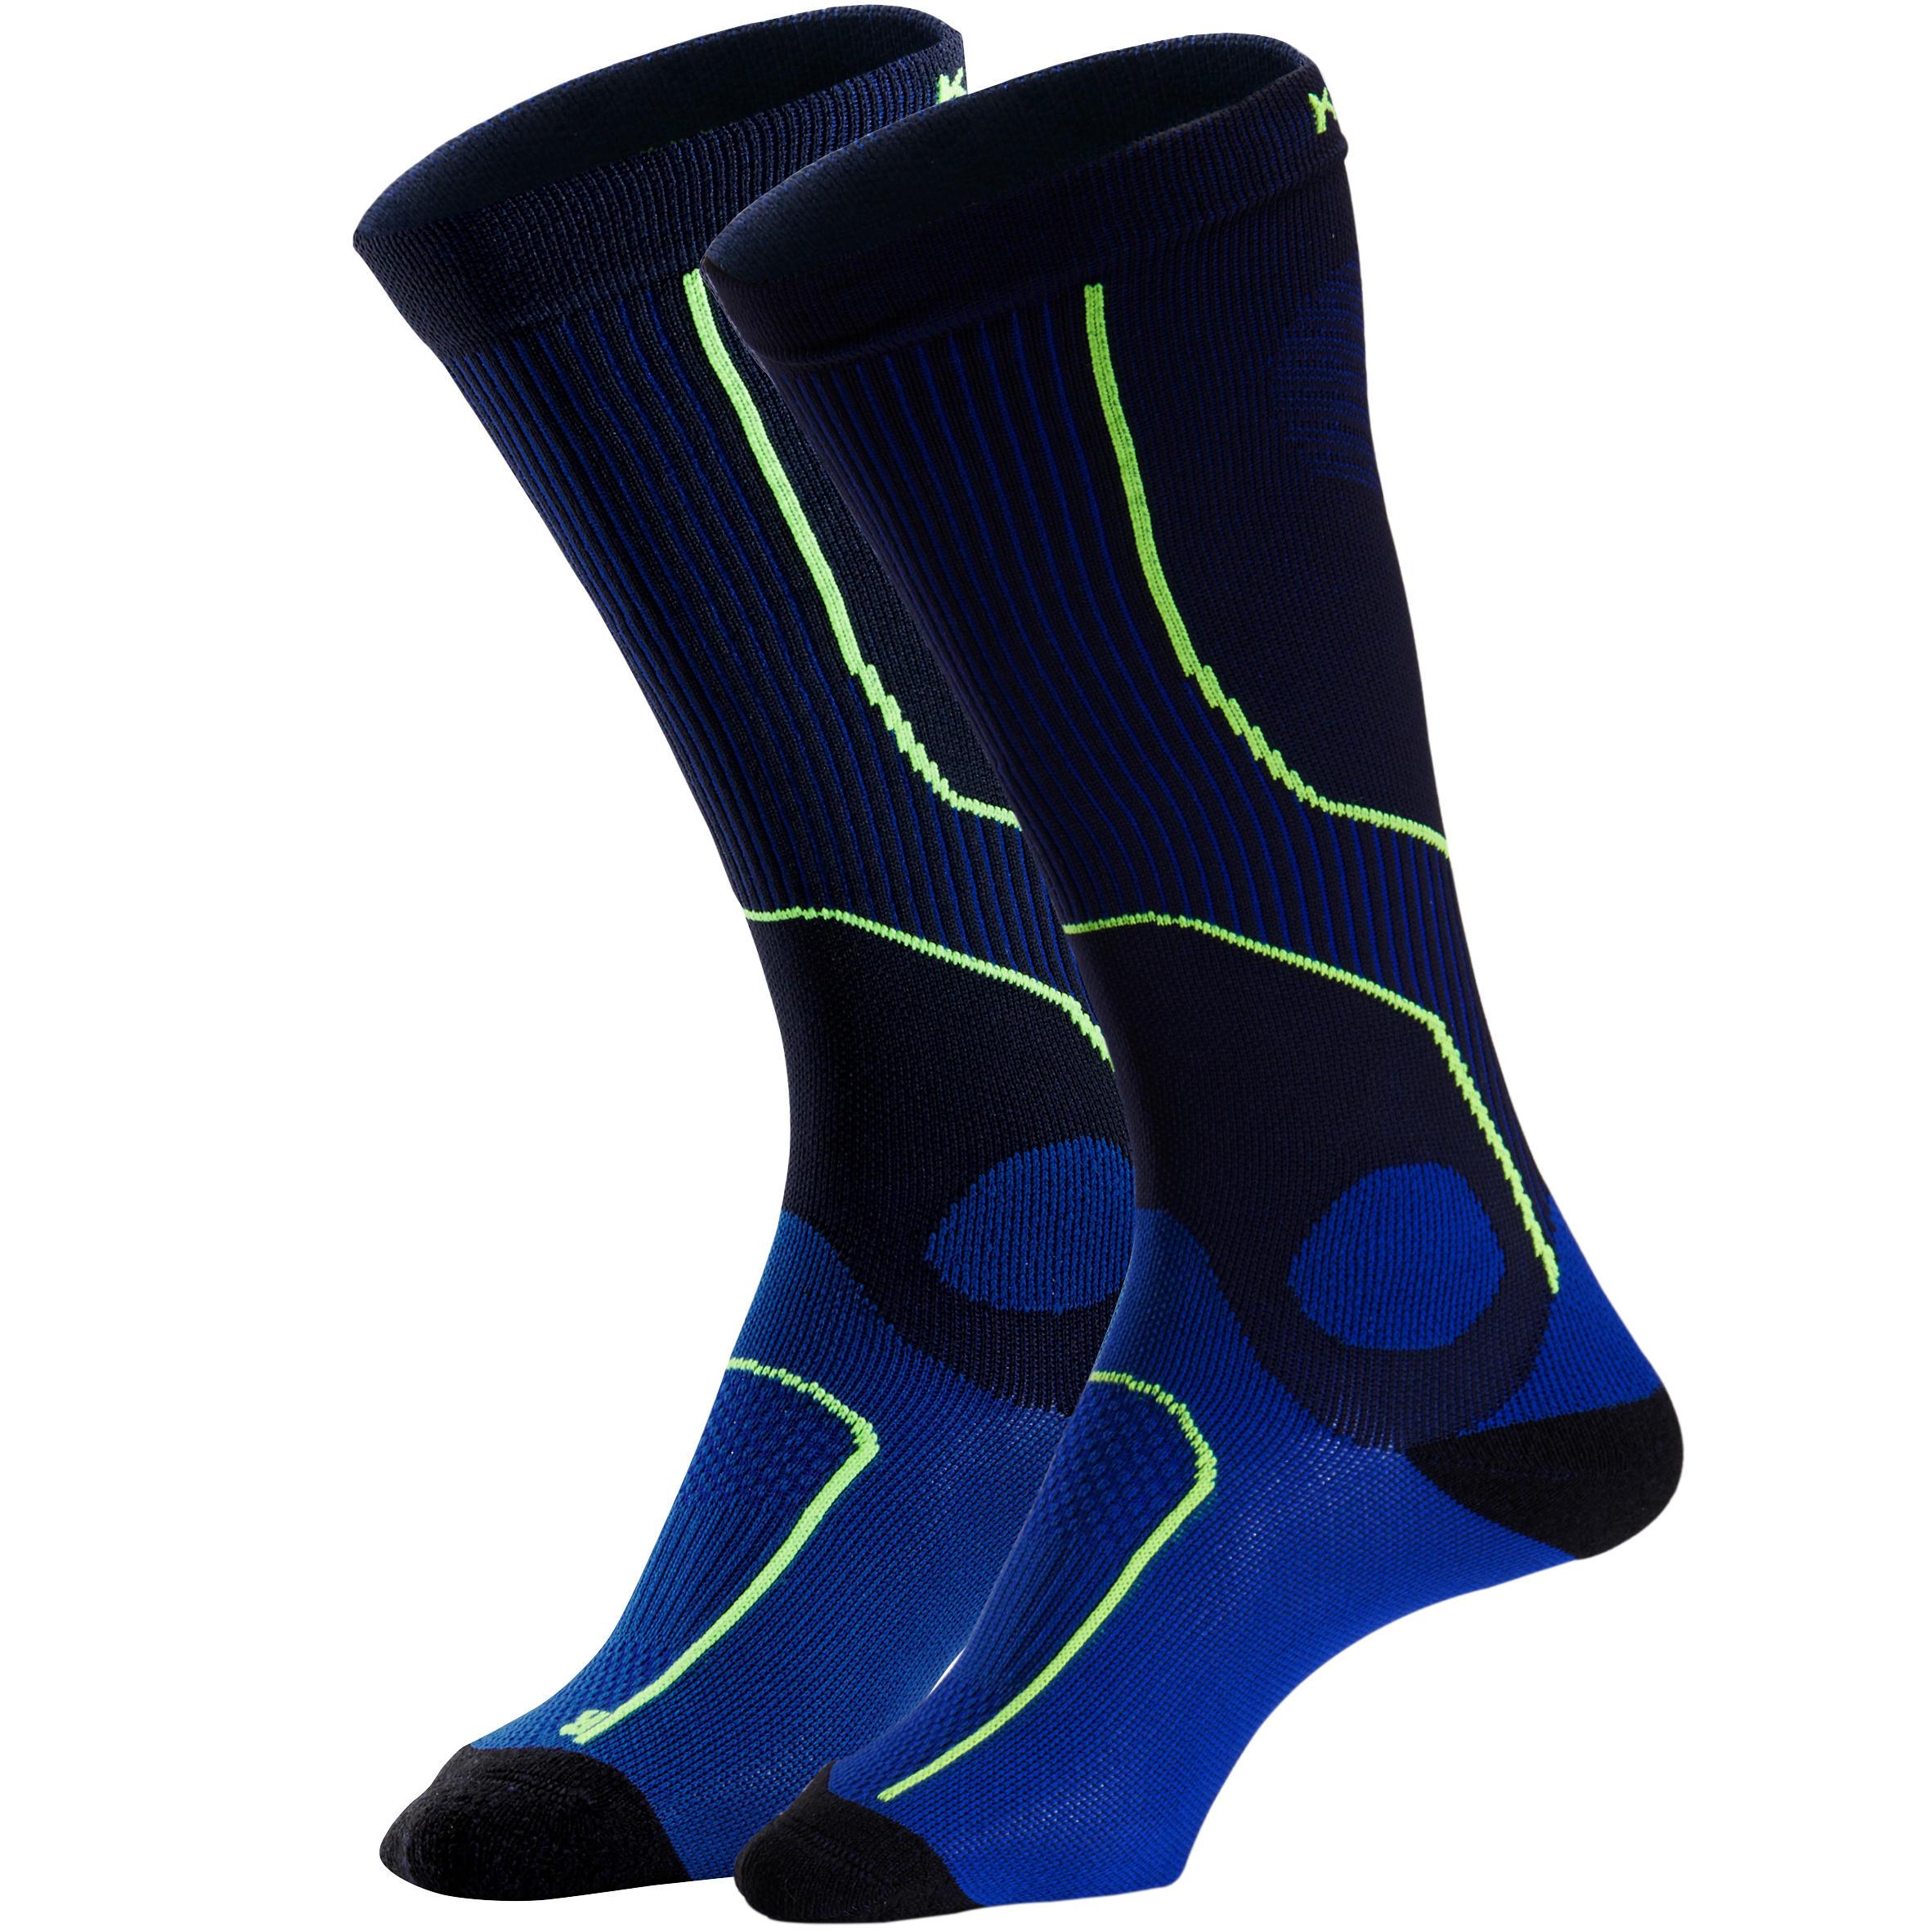 kompresyon çorabı